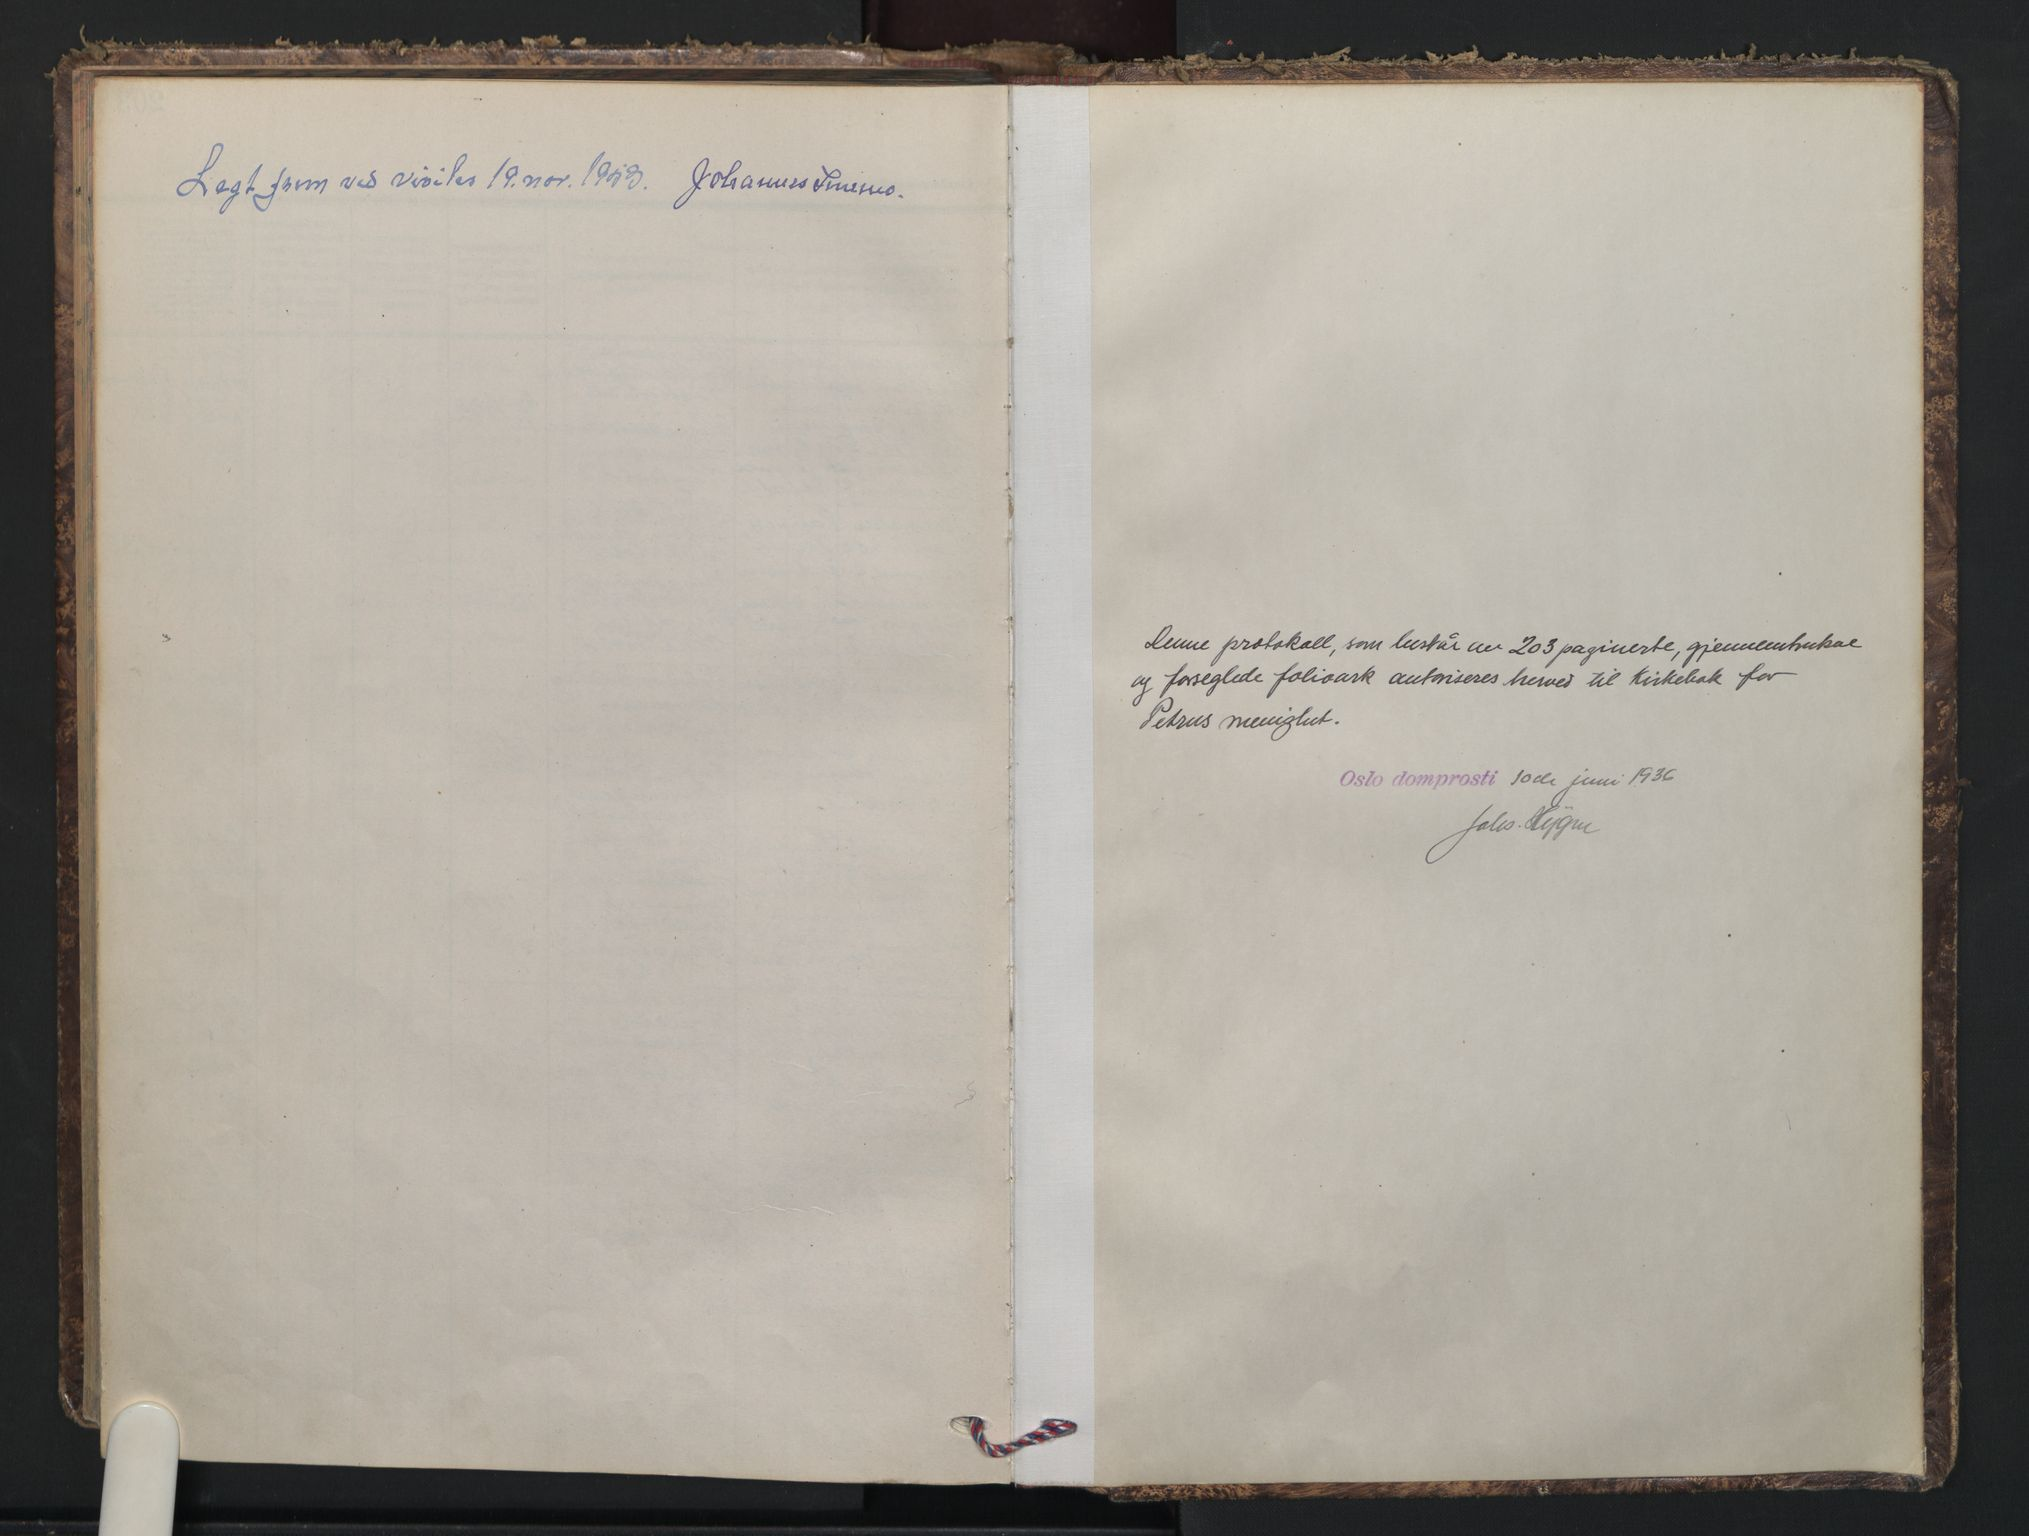 SAO, Petrus prestekontor Kirkebøker, F/Fa/L0018: Ministerialbok nr. 18, 1936-1944